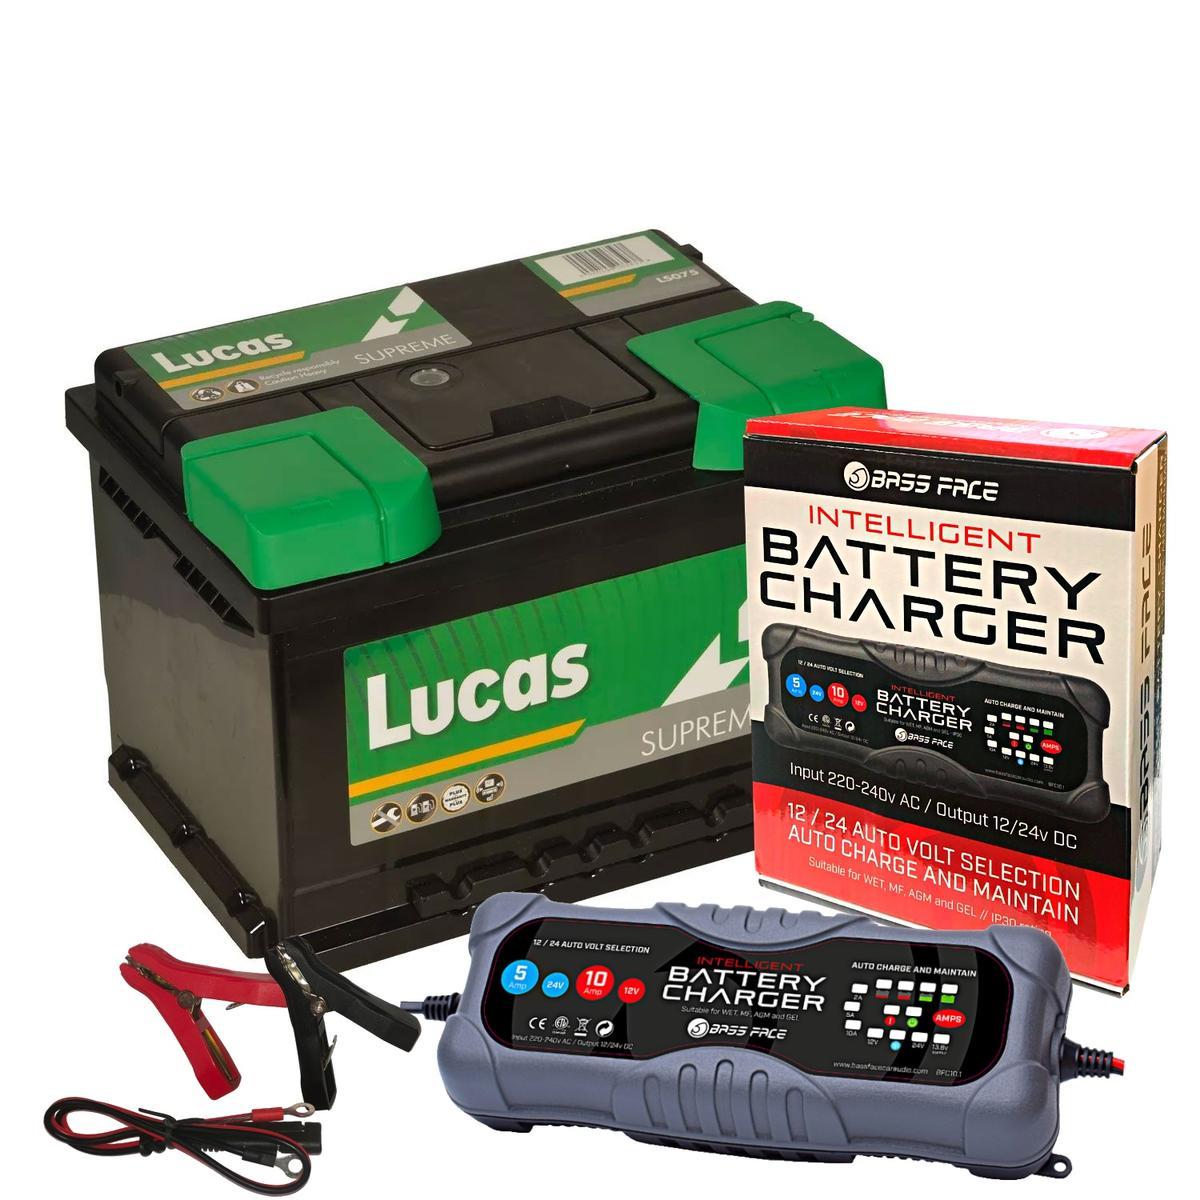 Lucas LS075 Vaux BMW VW Car Battery 12v 5 Year 075 62Ah 600CCA W/ 10 Amp Charger